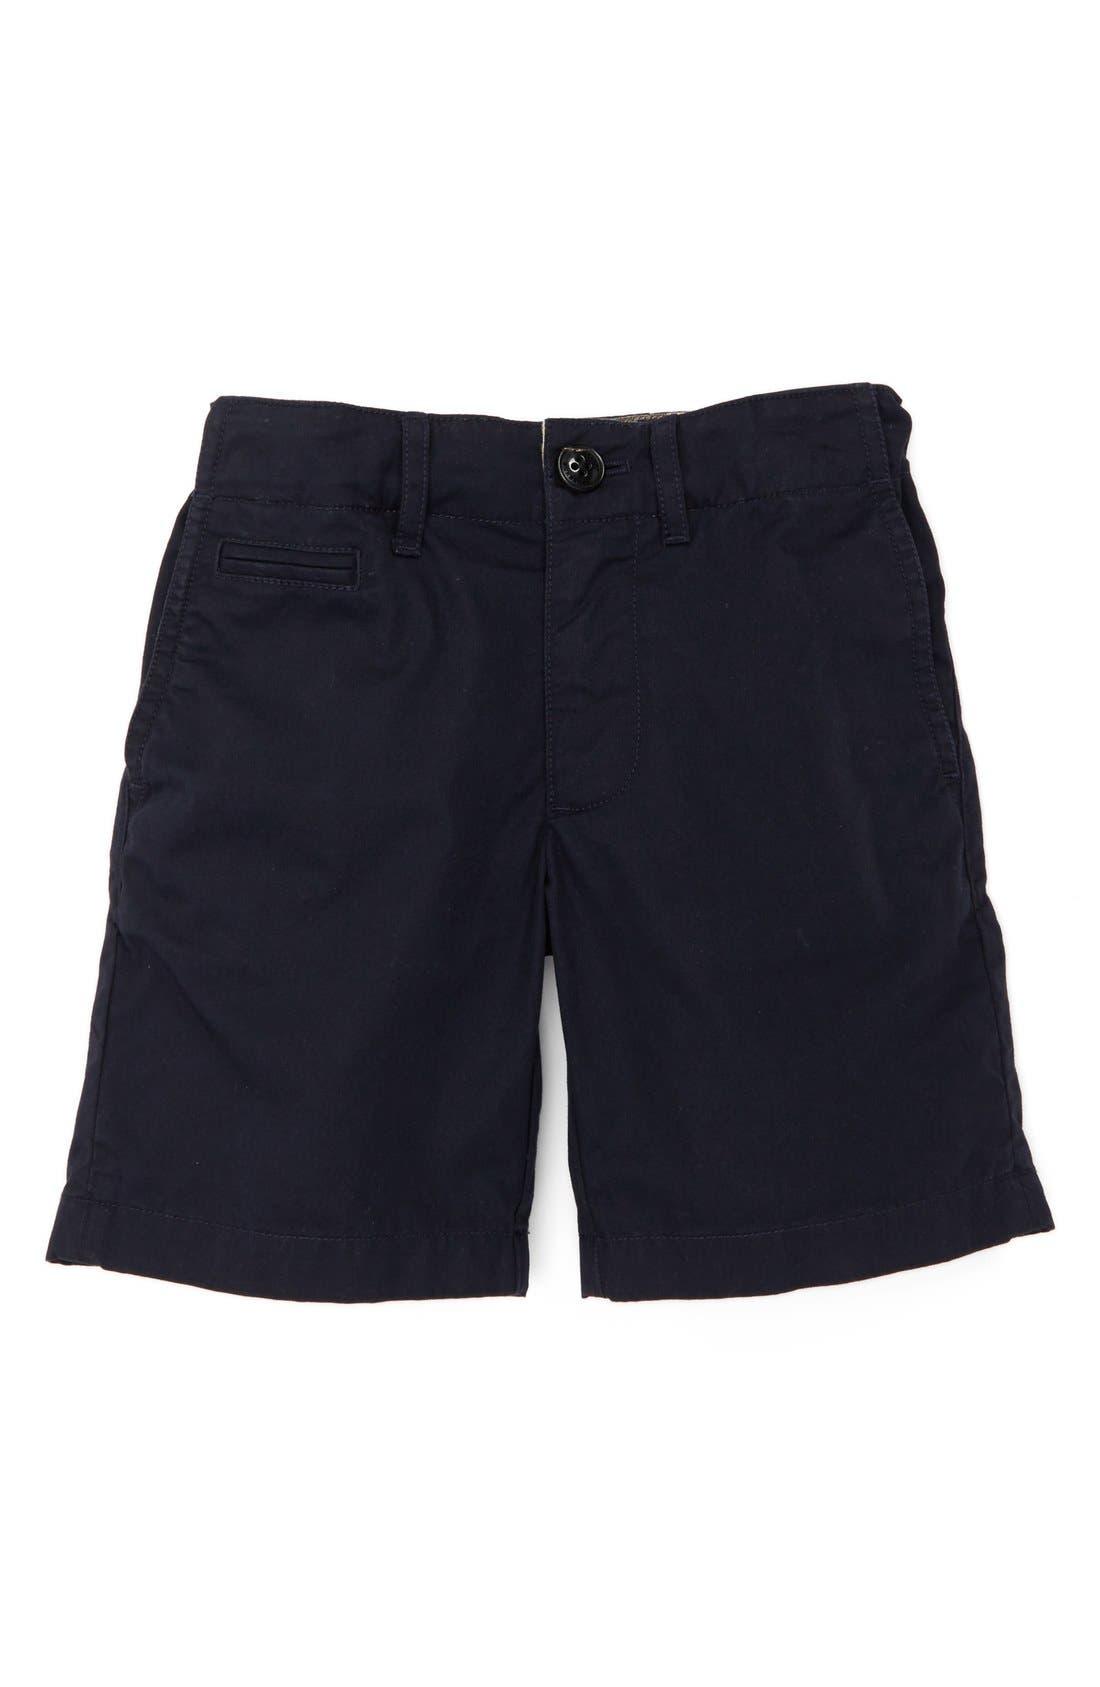 'Tristen' Shorts,                             Main thumbnail 1, color,                             400